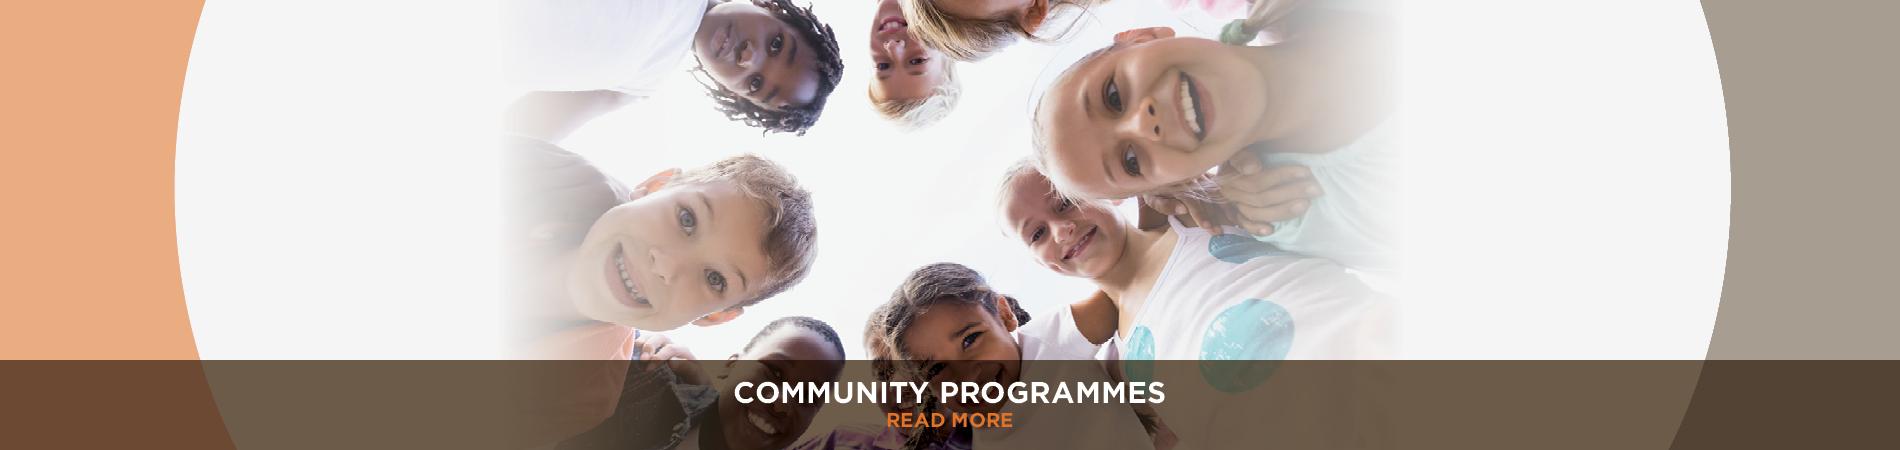 Community Programmes